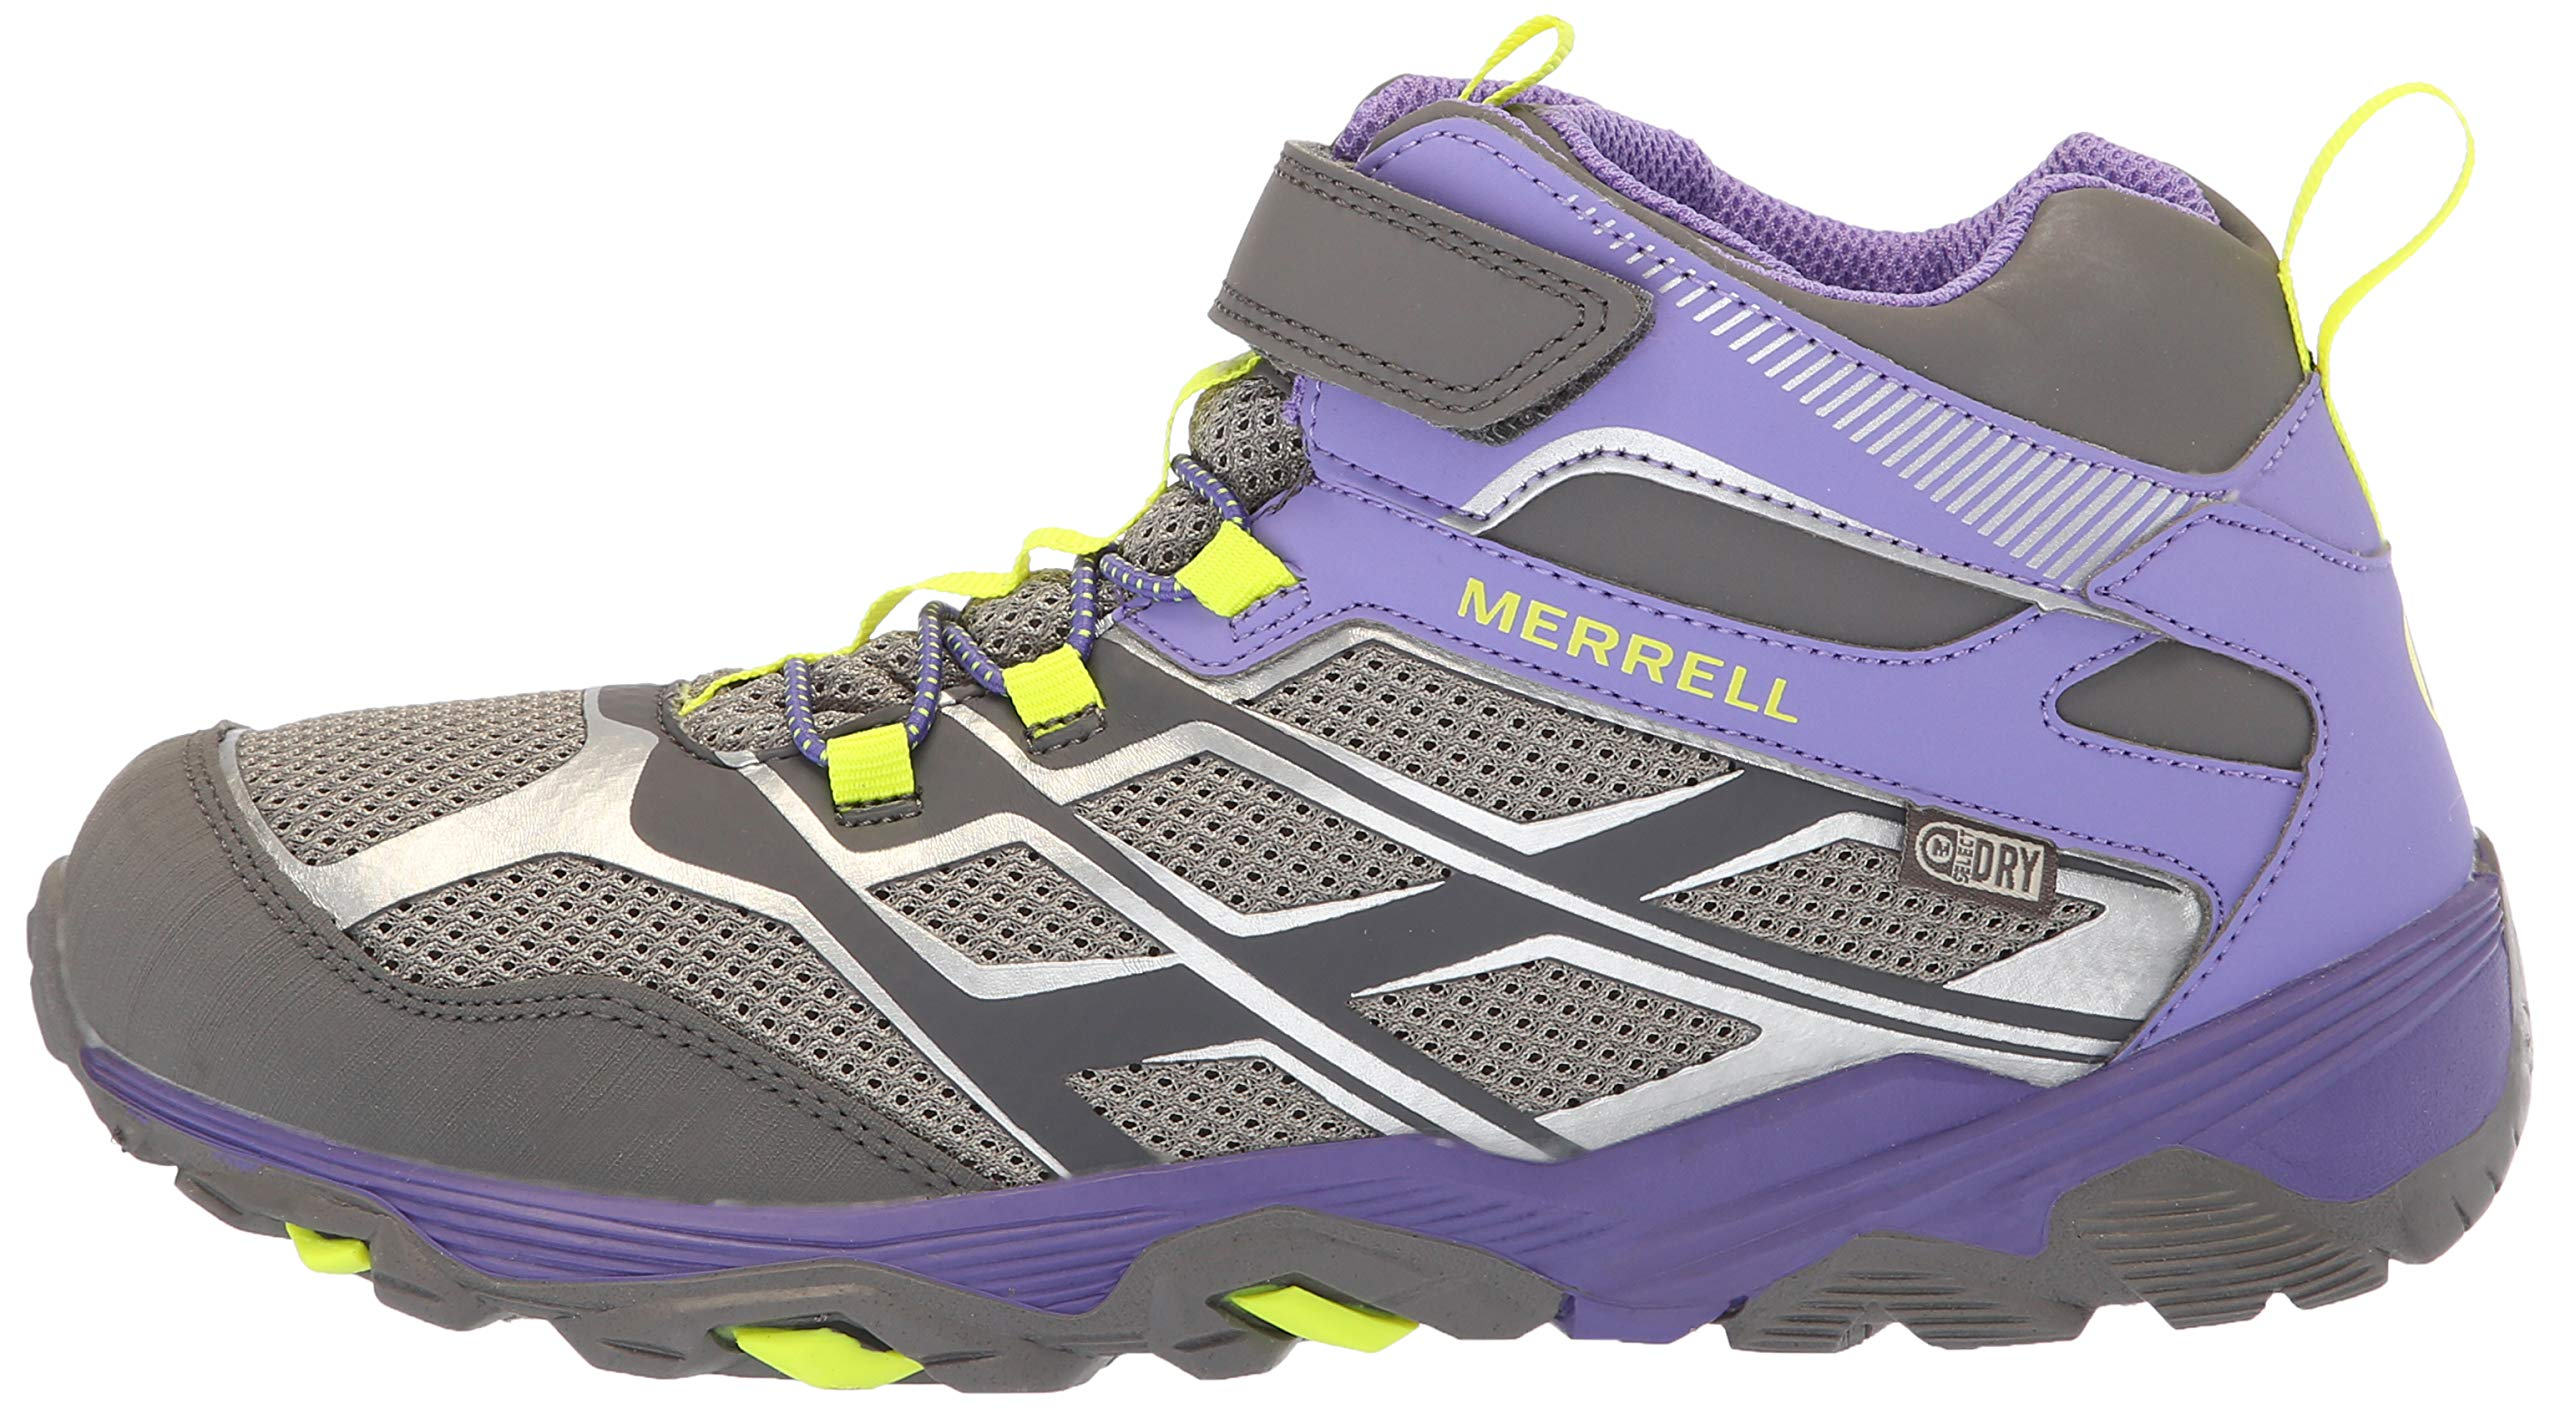 Merrell Girls' Moab FST Mid A/C WTRPF Hiking Shoe, Grey/Purple, 3.5 Medium US Big Kid by Merrell (Image #5)